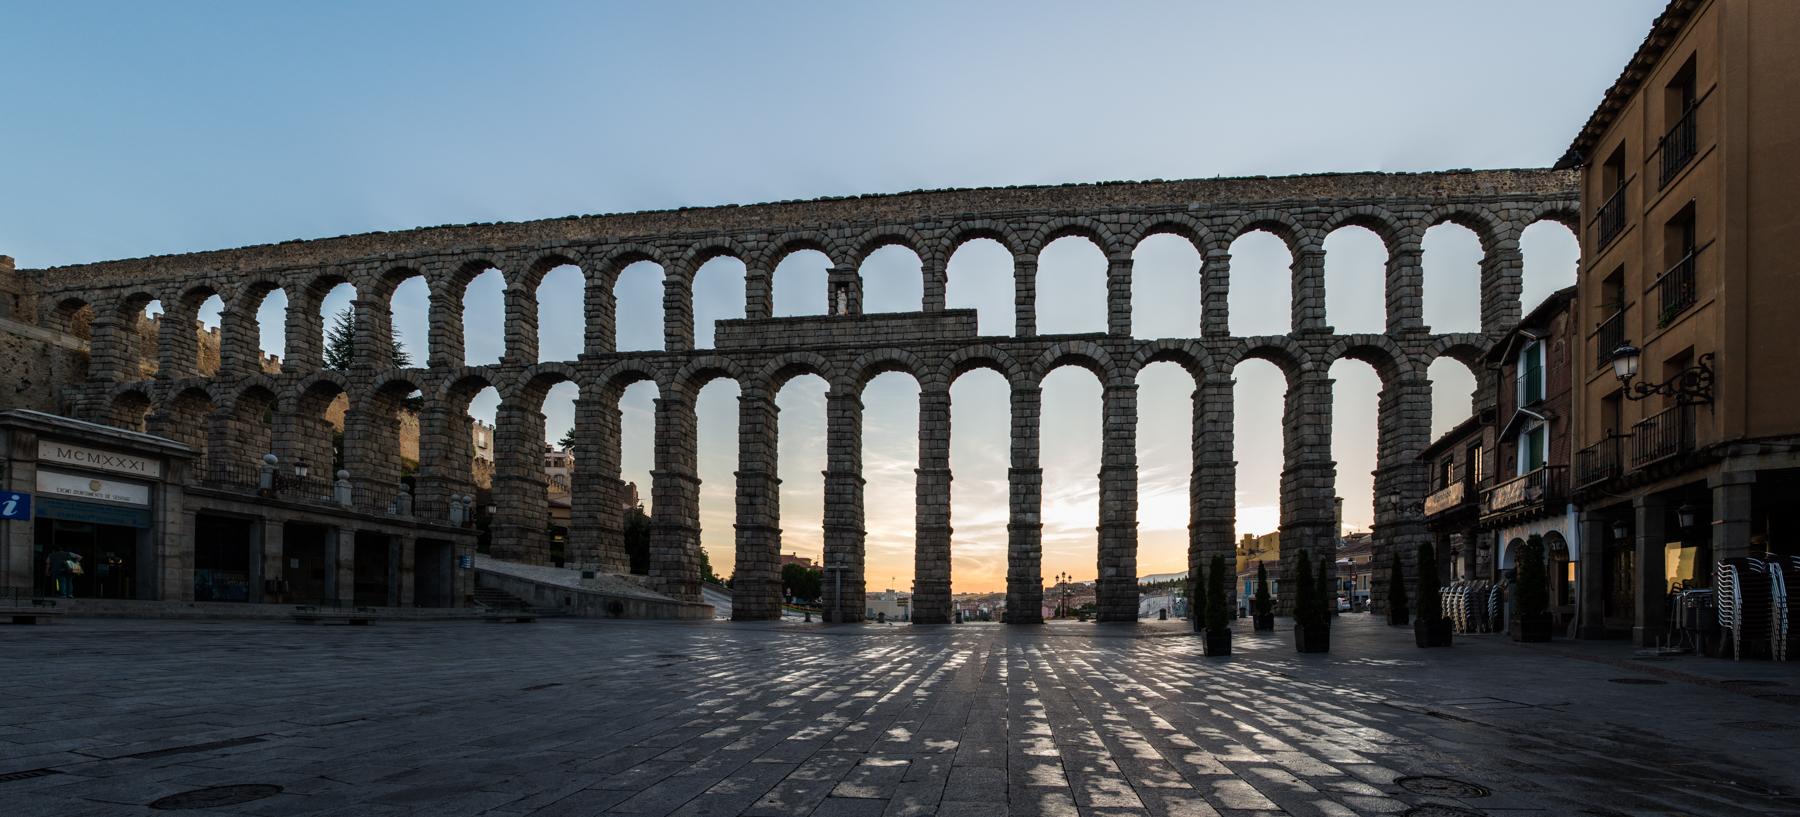 File:Acueducto de Segovia, panorámica al amanecer.jpg - Wikimedia Commons